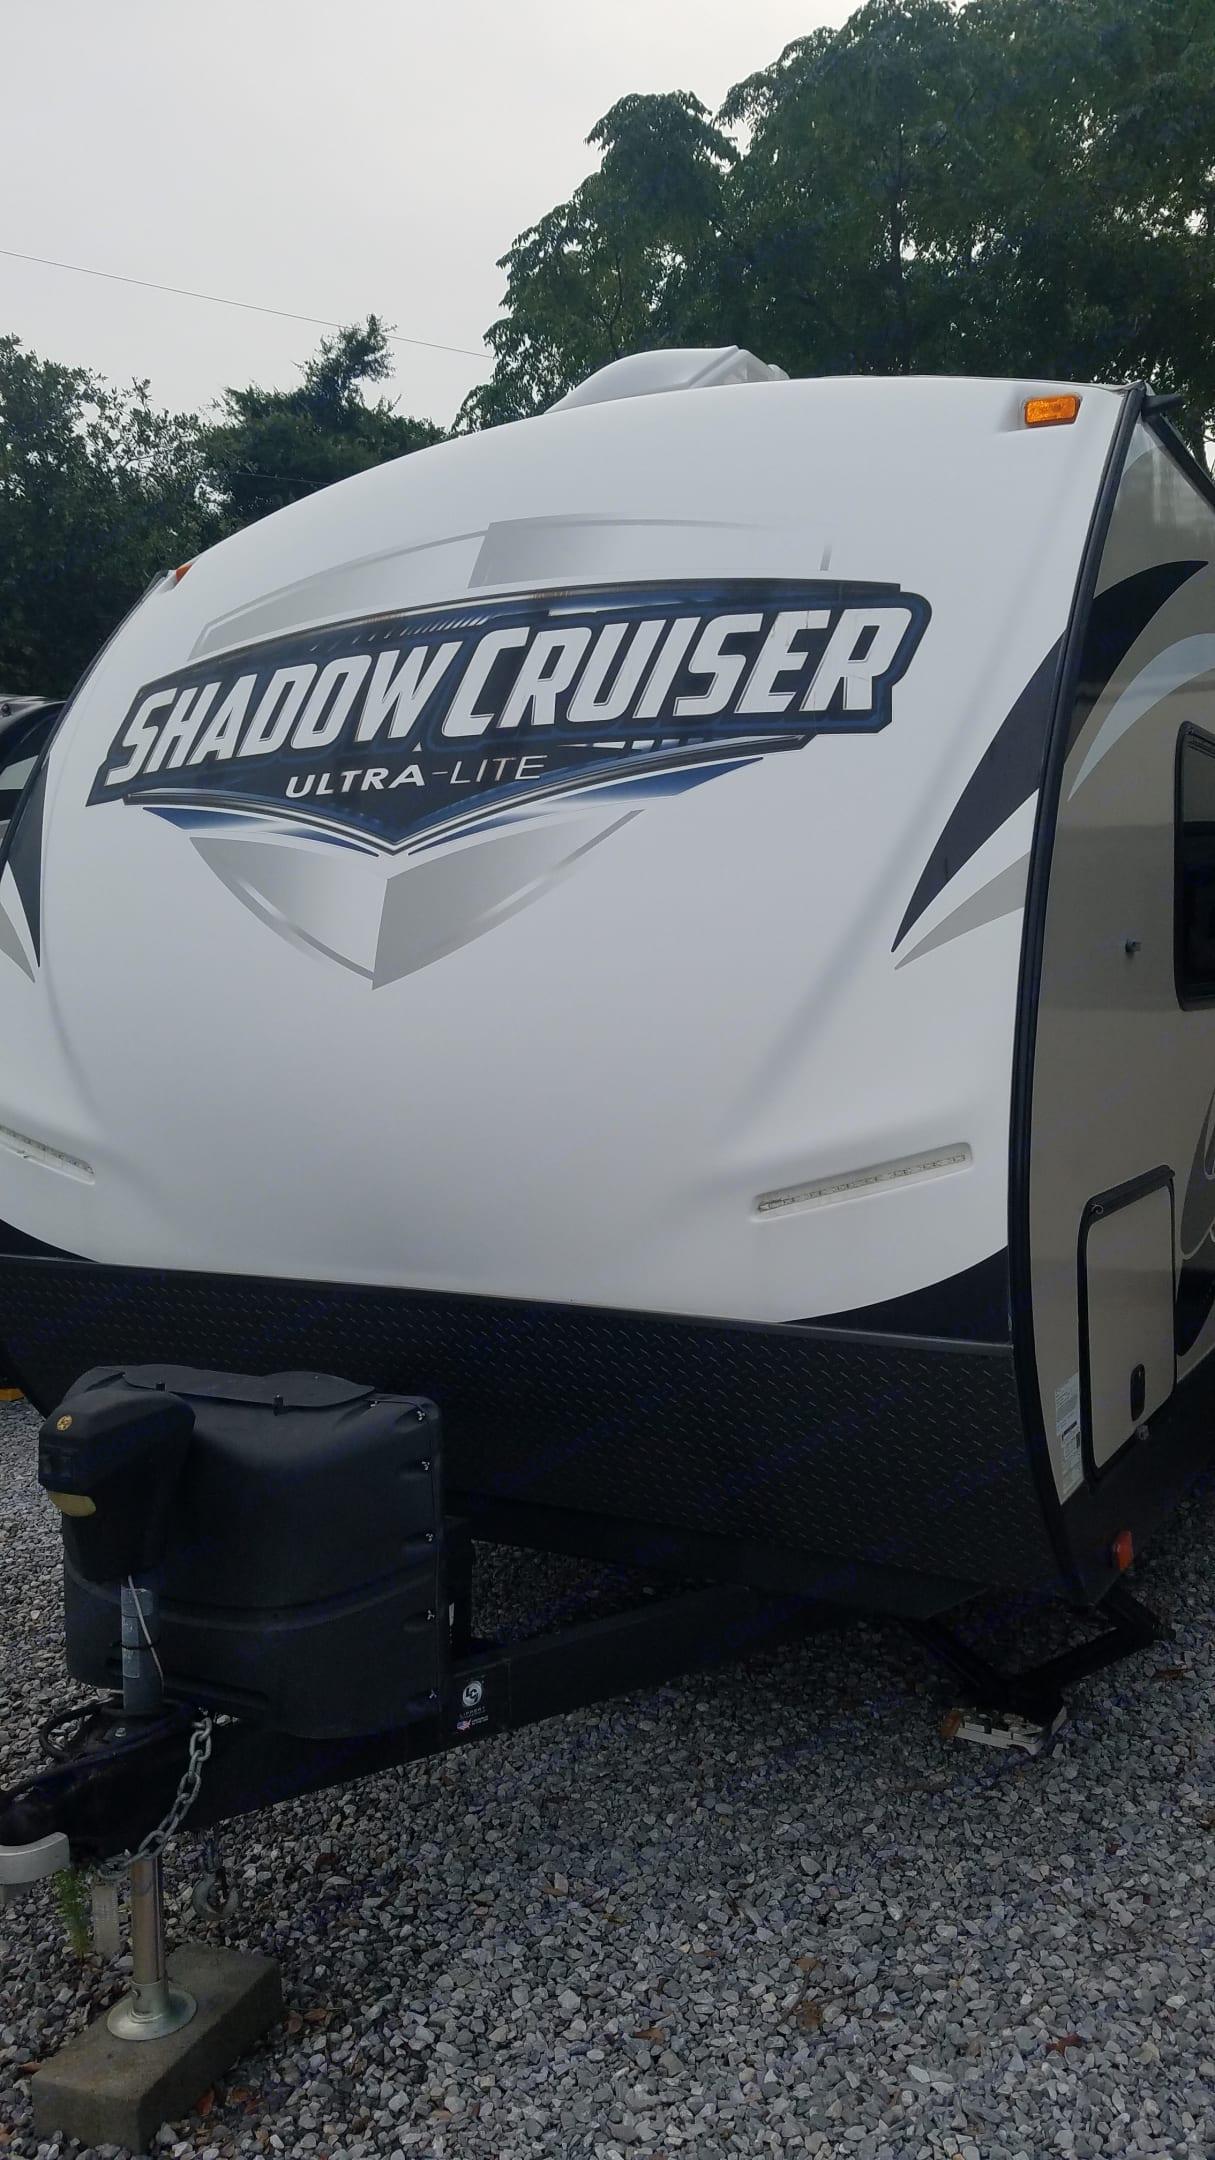 Cruiser Rv Corp Shadow Cruiser 2017